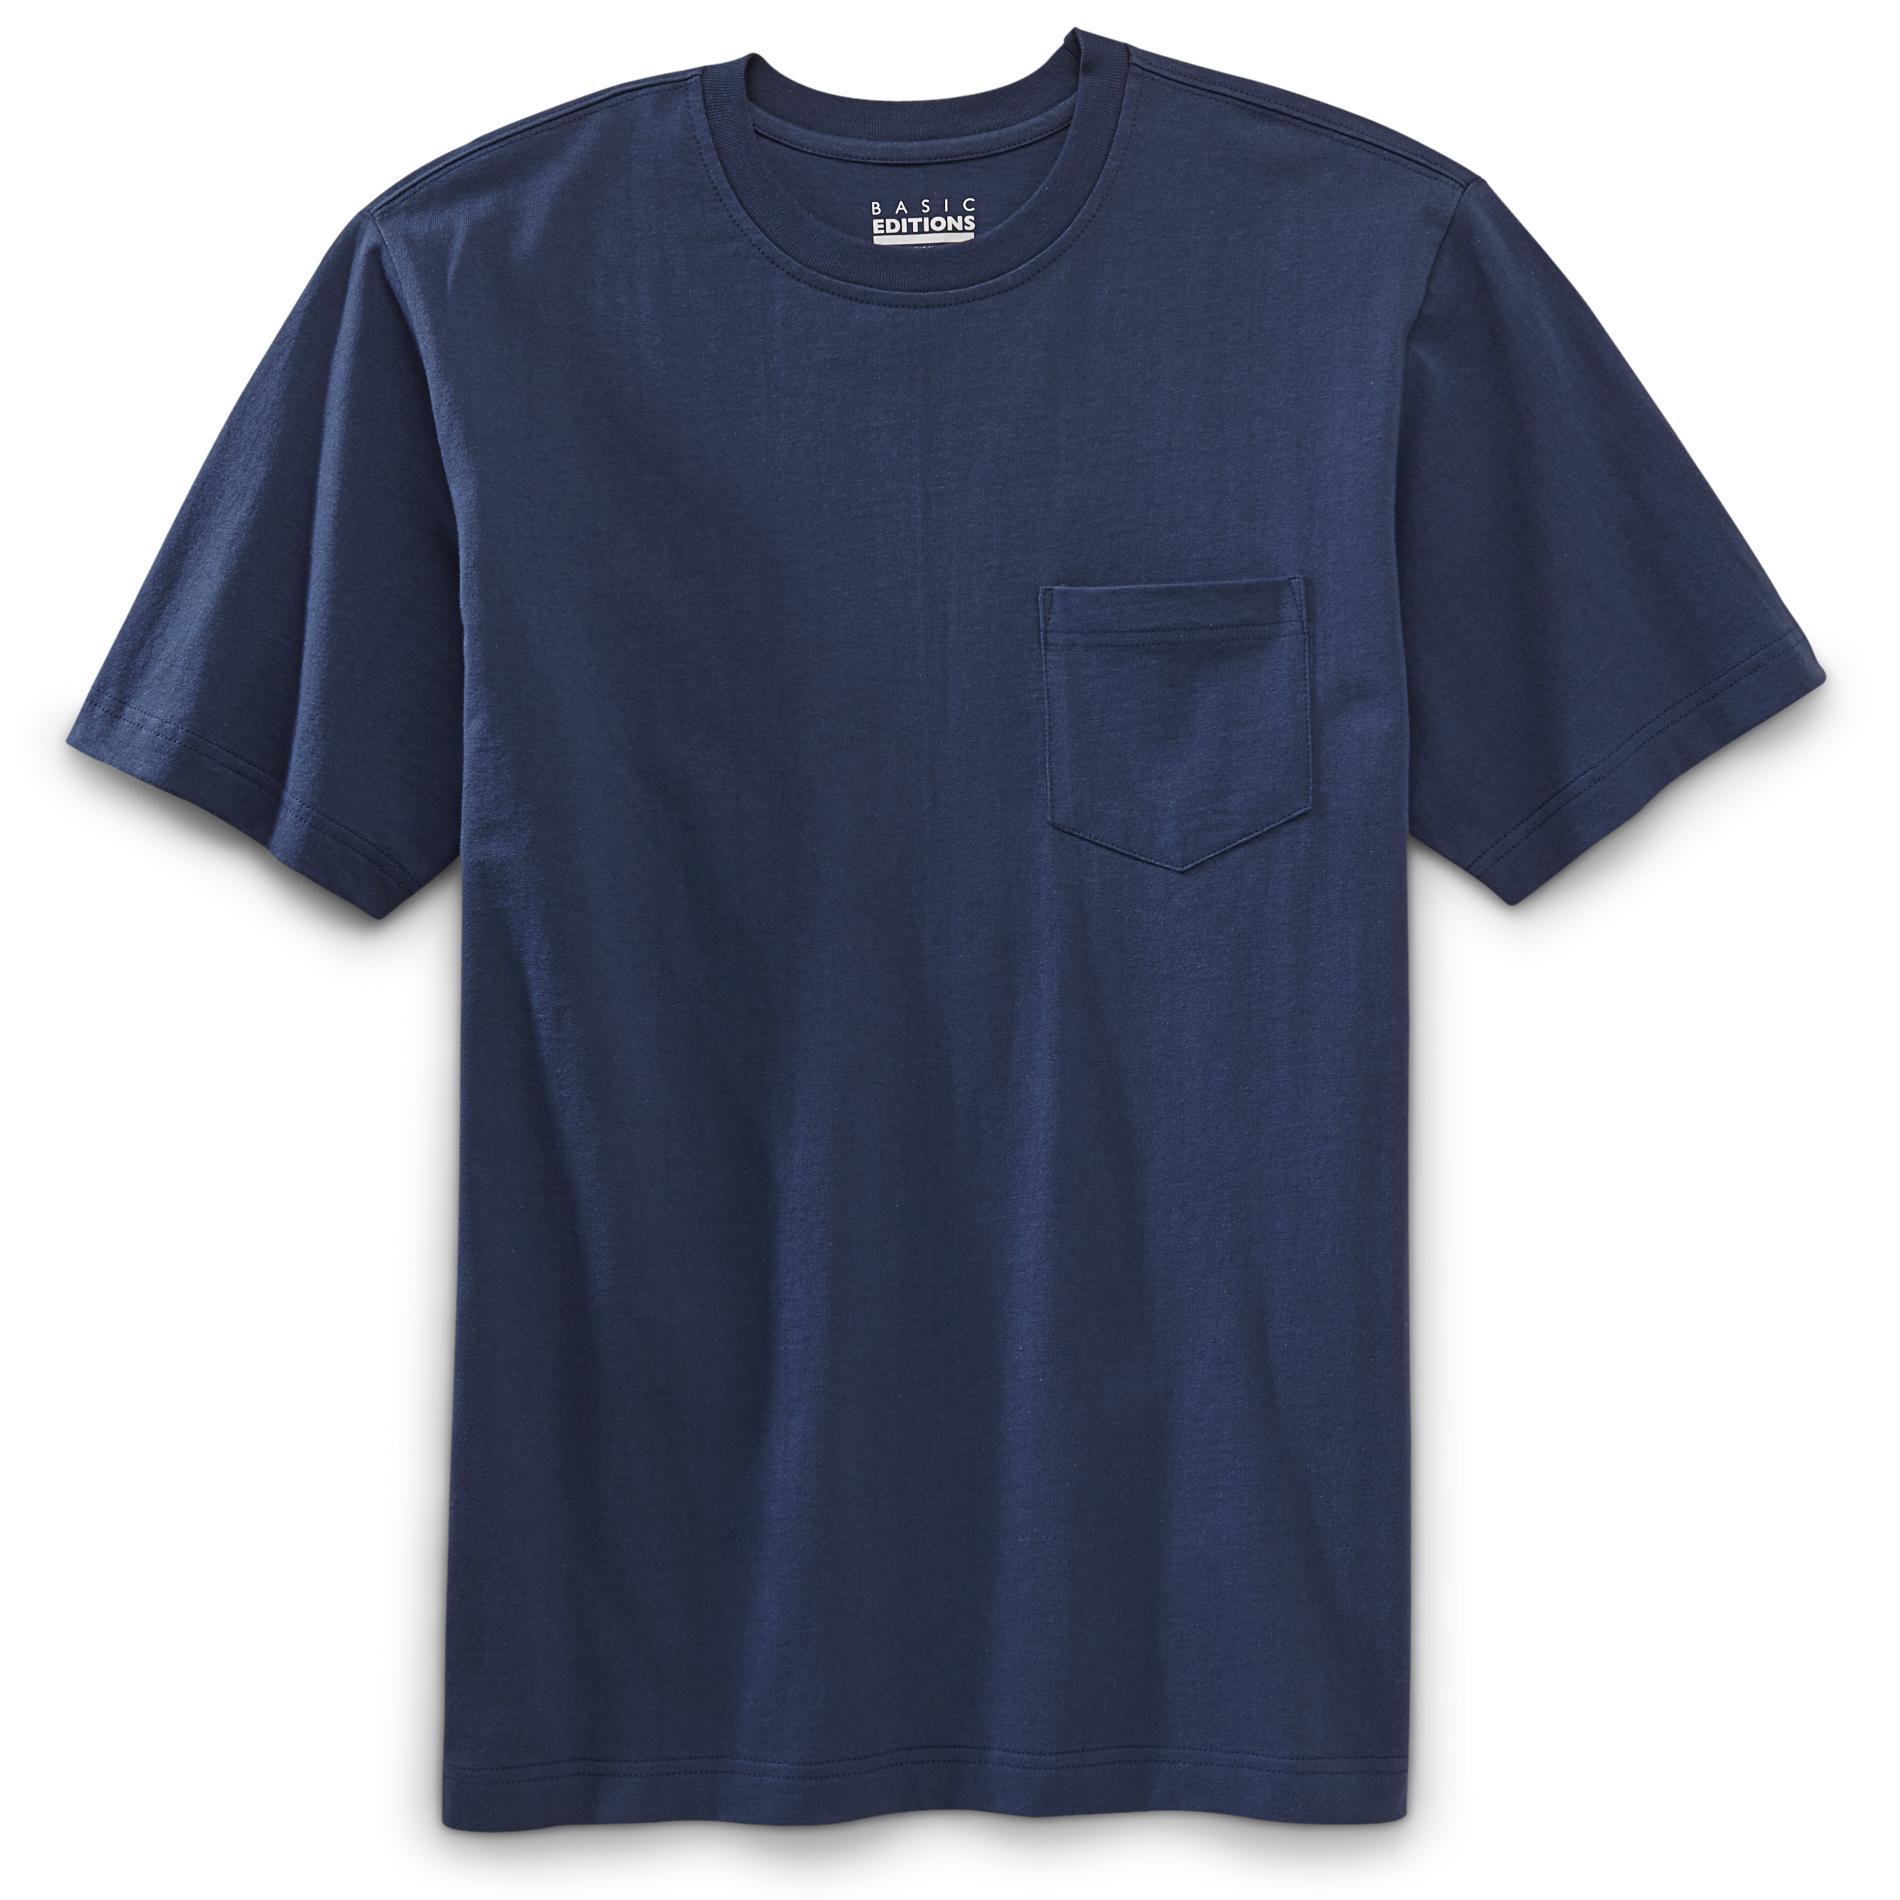 Basic Editions Mens Big Amp Tall Pocket T Shirt Size XLT